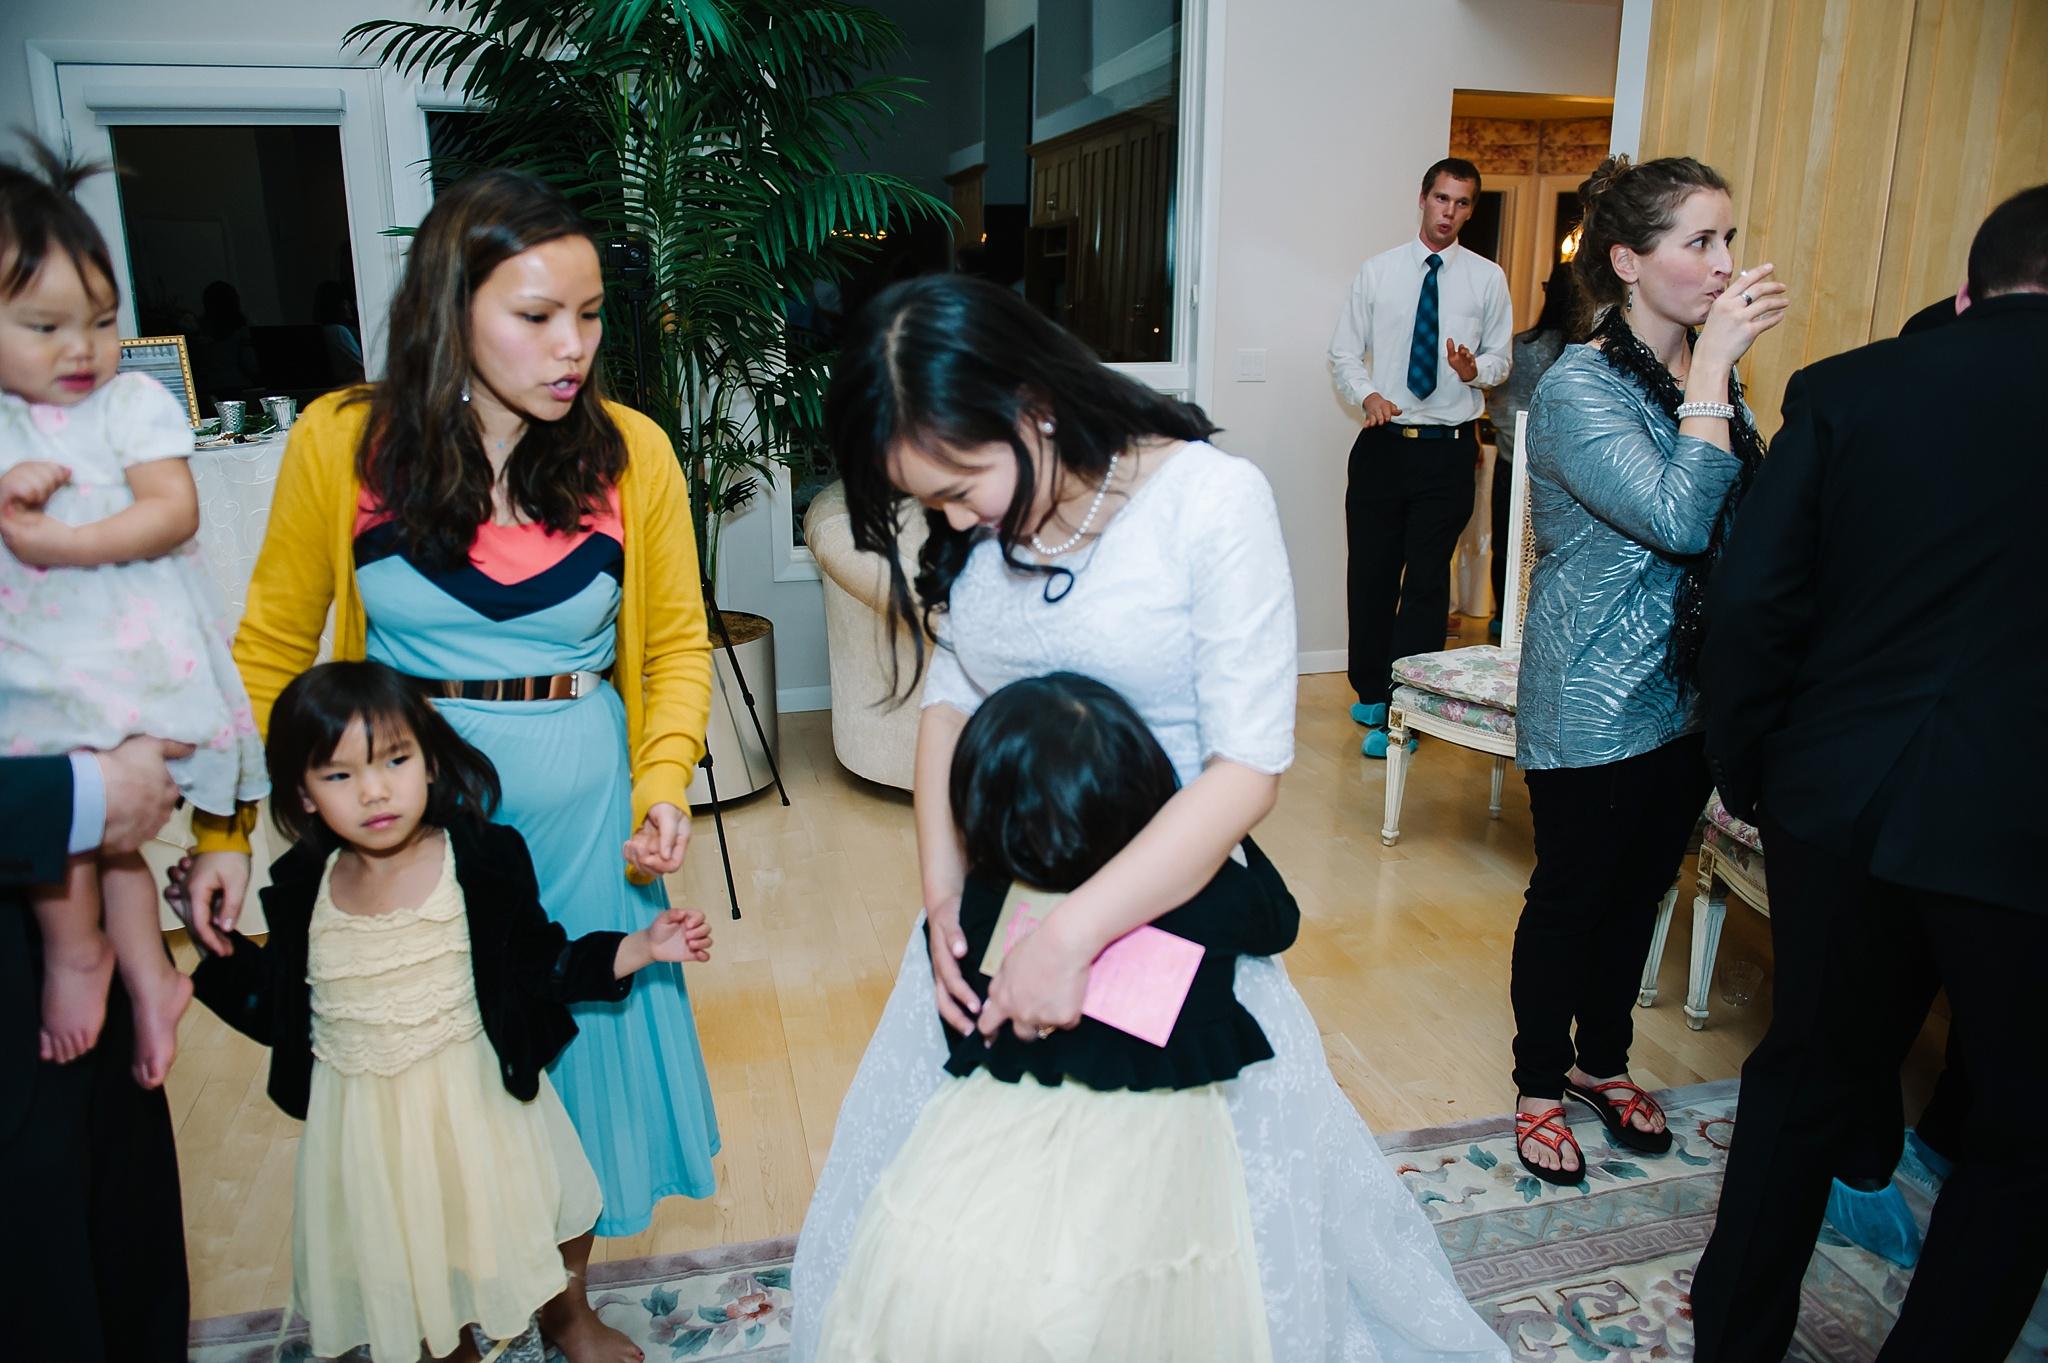 Salt Lake City Wedding Photographer Ali Sumsion 057